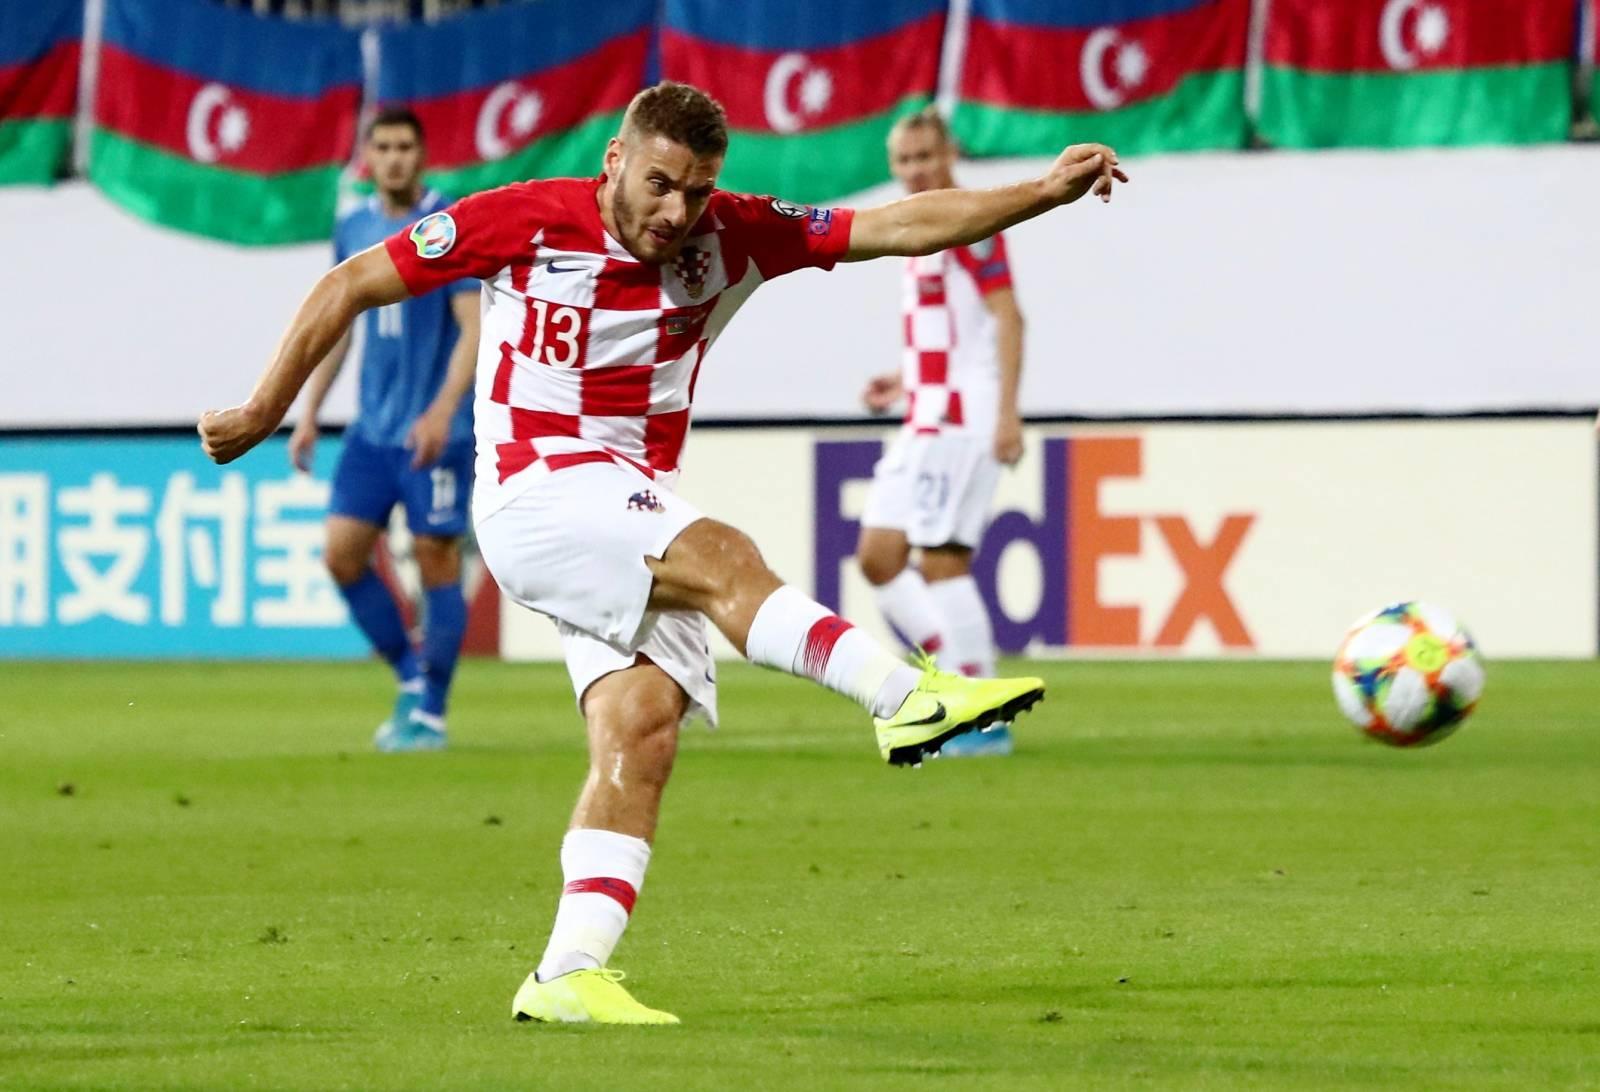 Euro 2020 Qualifier - Group E - Azerbaijan v Croatia